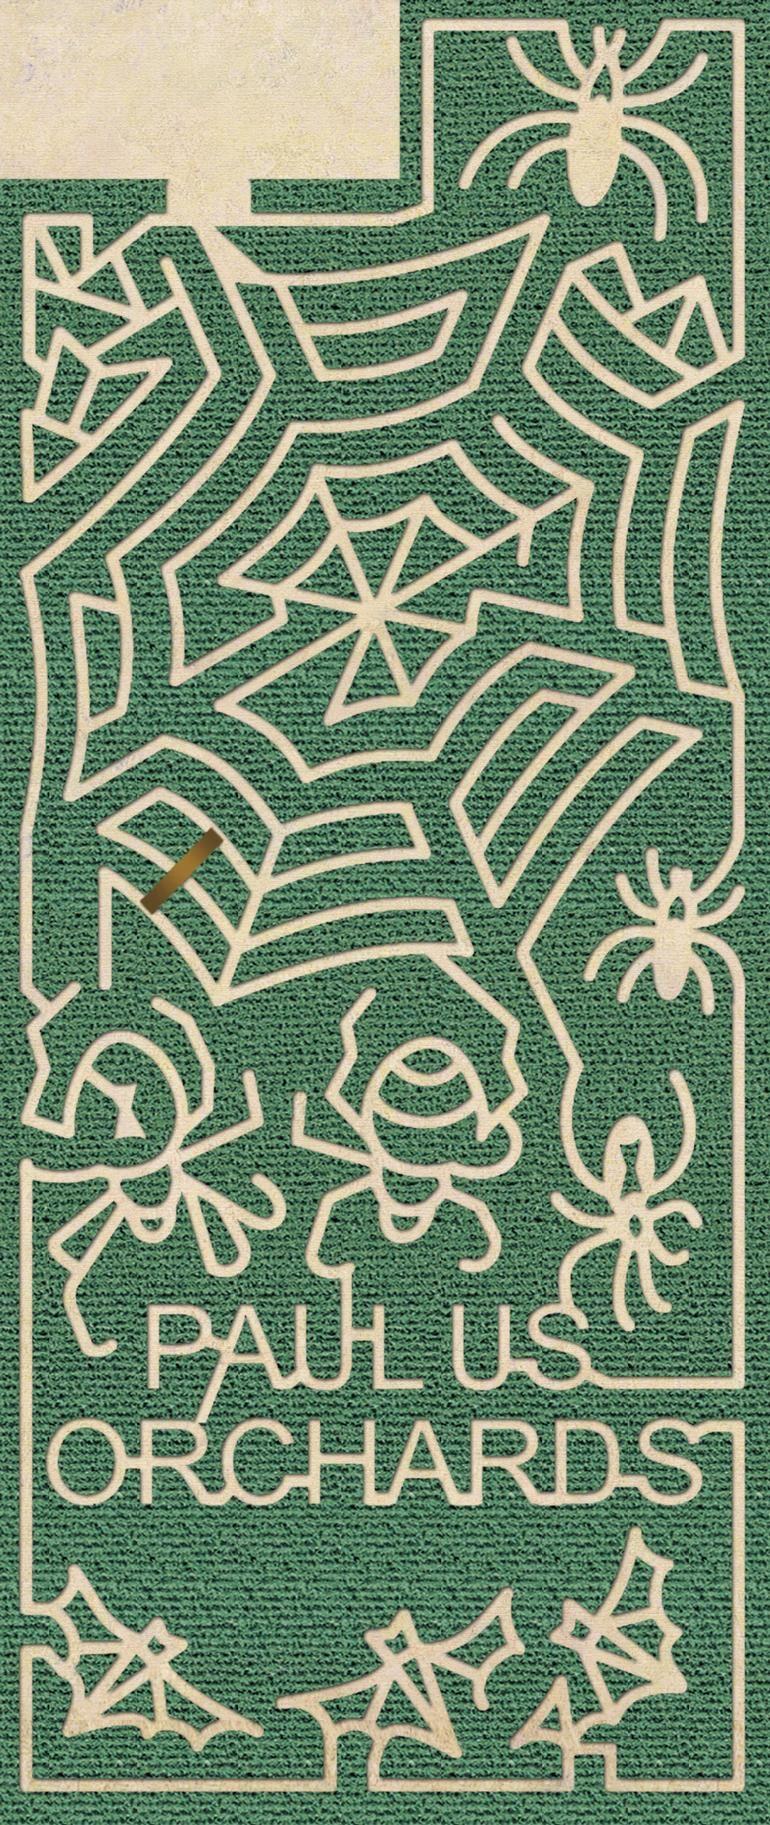 Paulus Orchards - Corn Maze